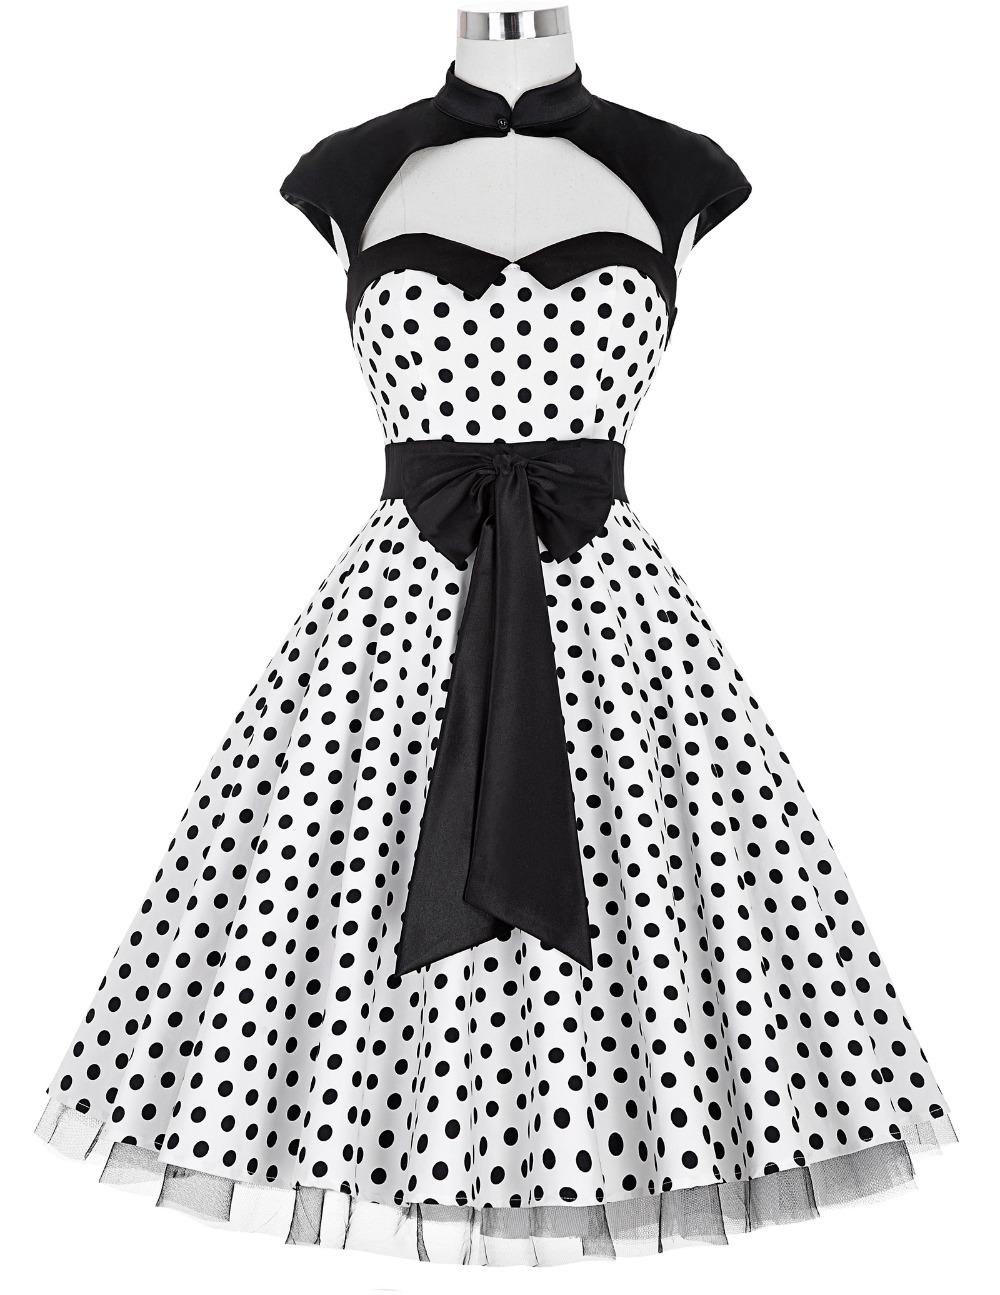 Buy Polka Dots Dresses 2016 New Summer Style Women 60s 40s Rockabilly Dress